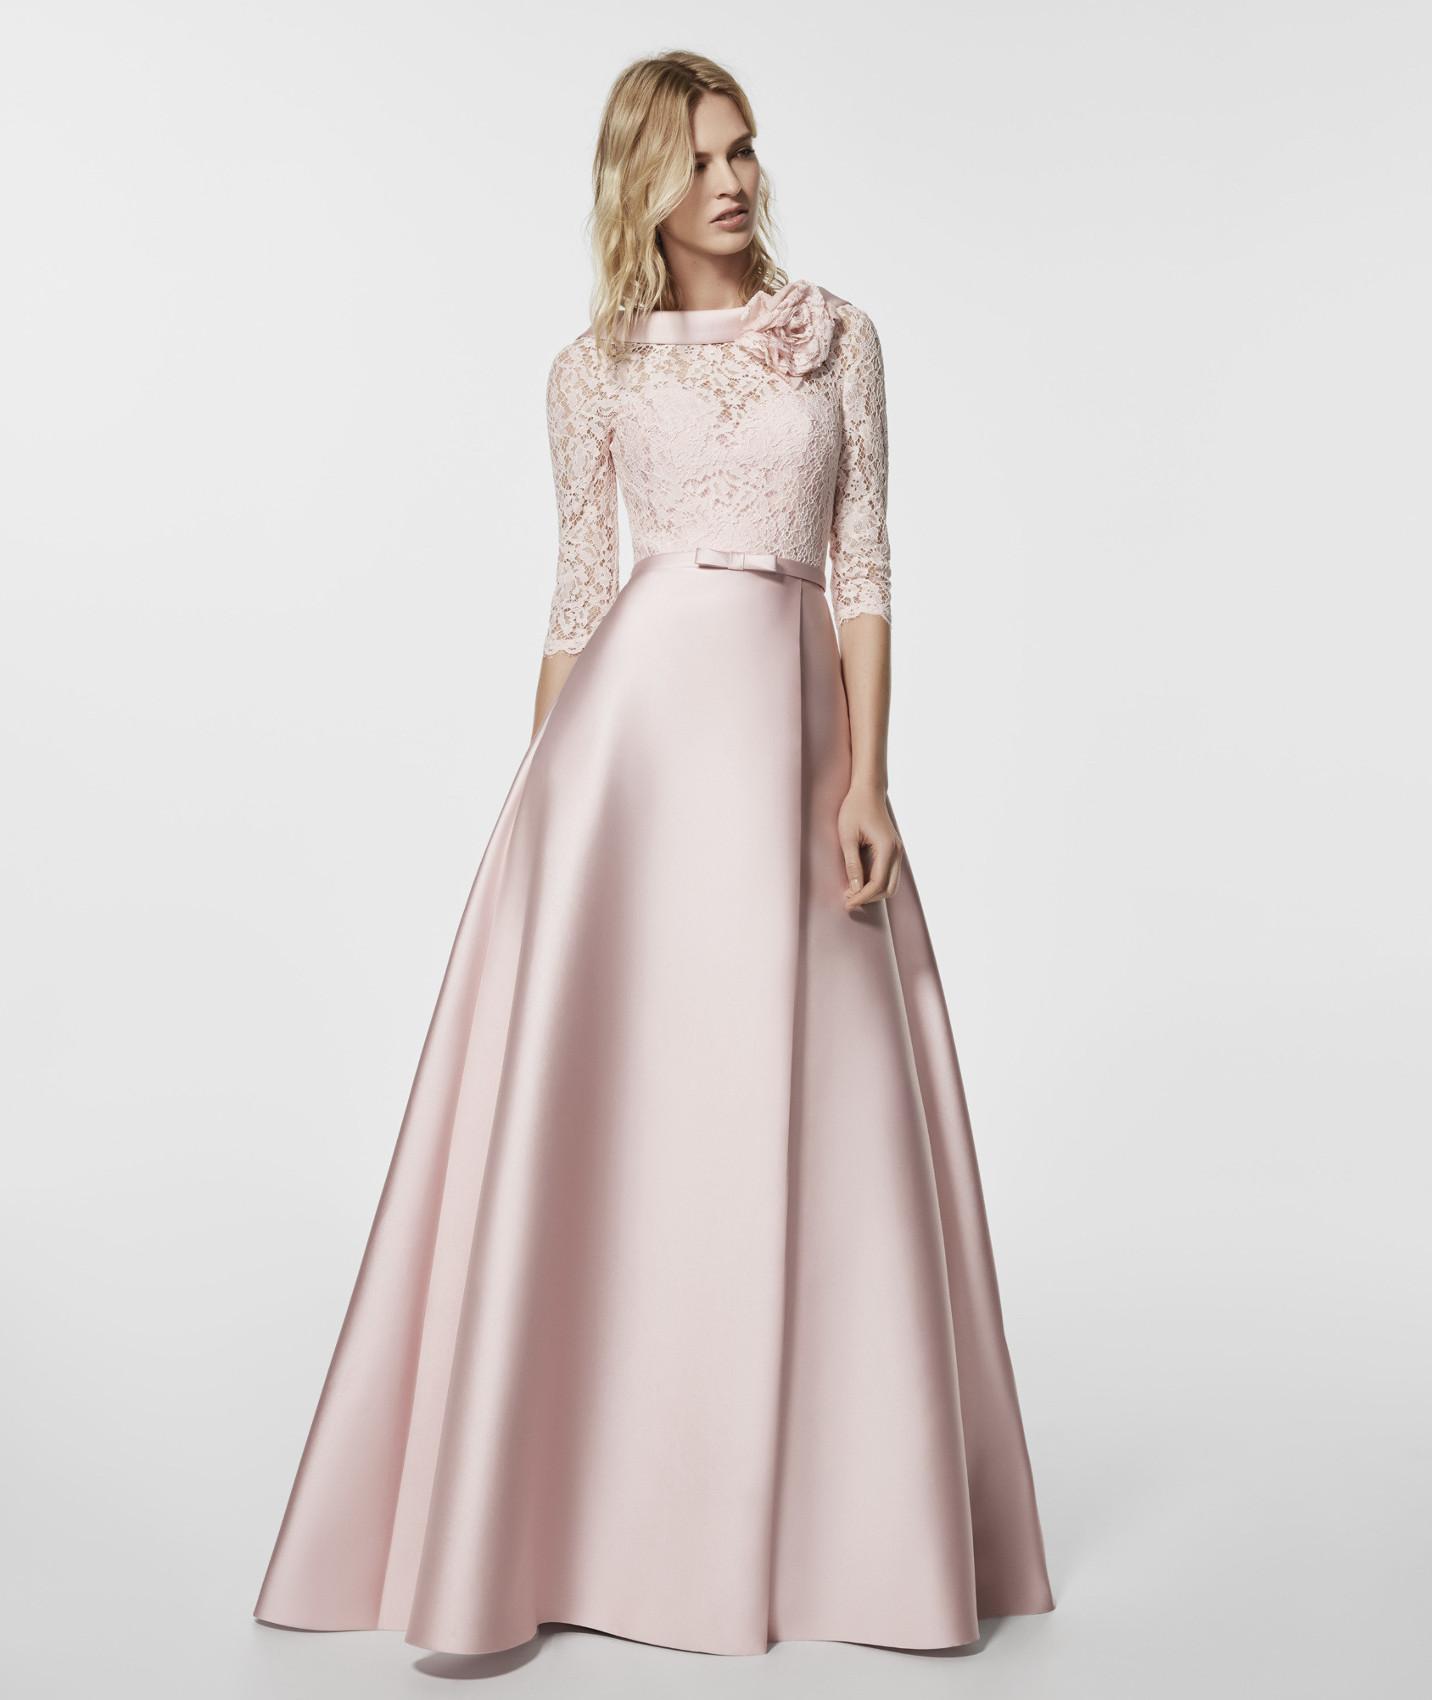 Glorymar suknelė